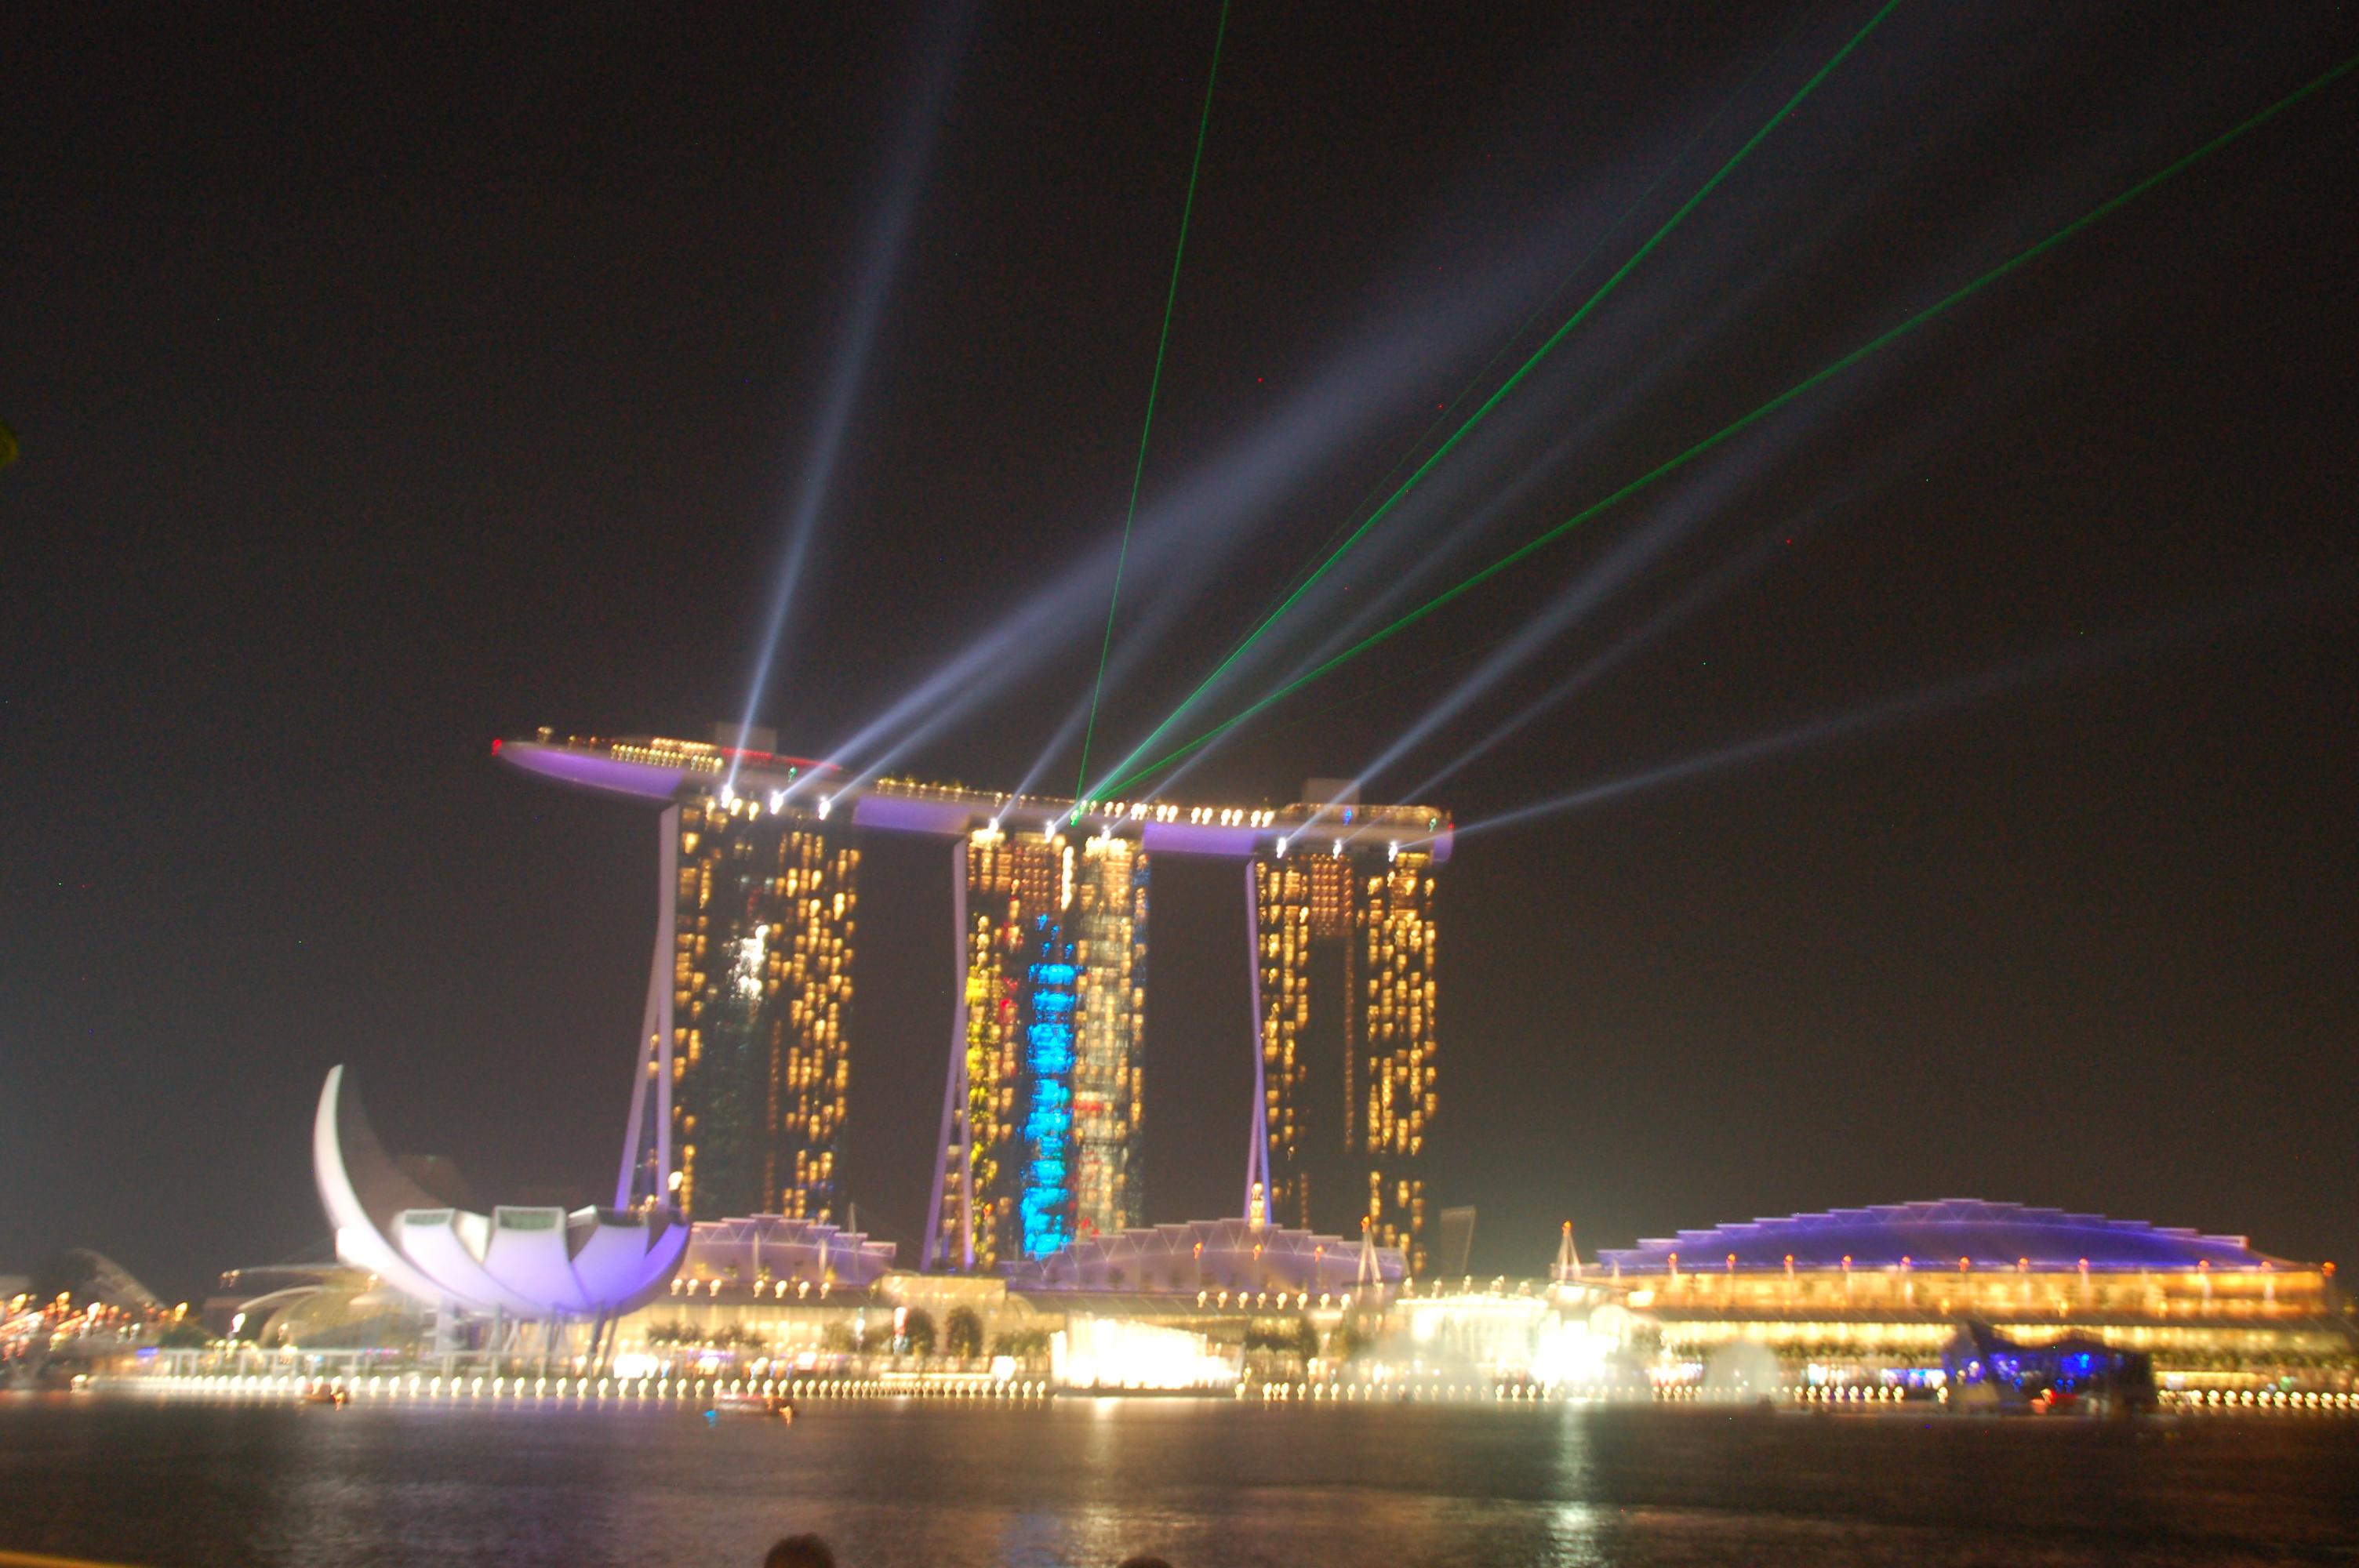 Pool on the 57th floor of marina bay sands casino in singapore titan poker bonus code no deposit 2015